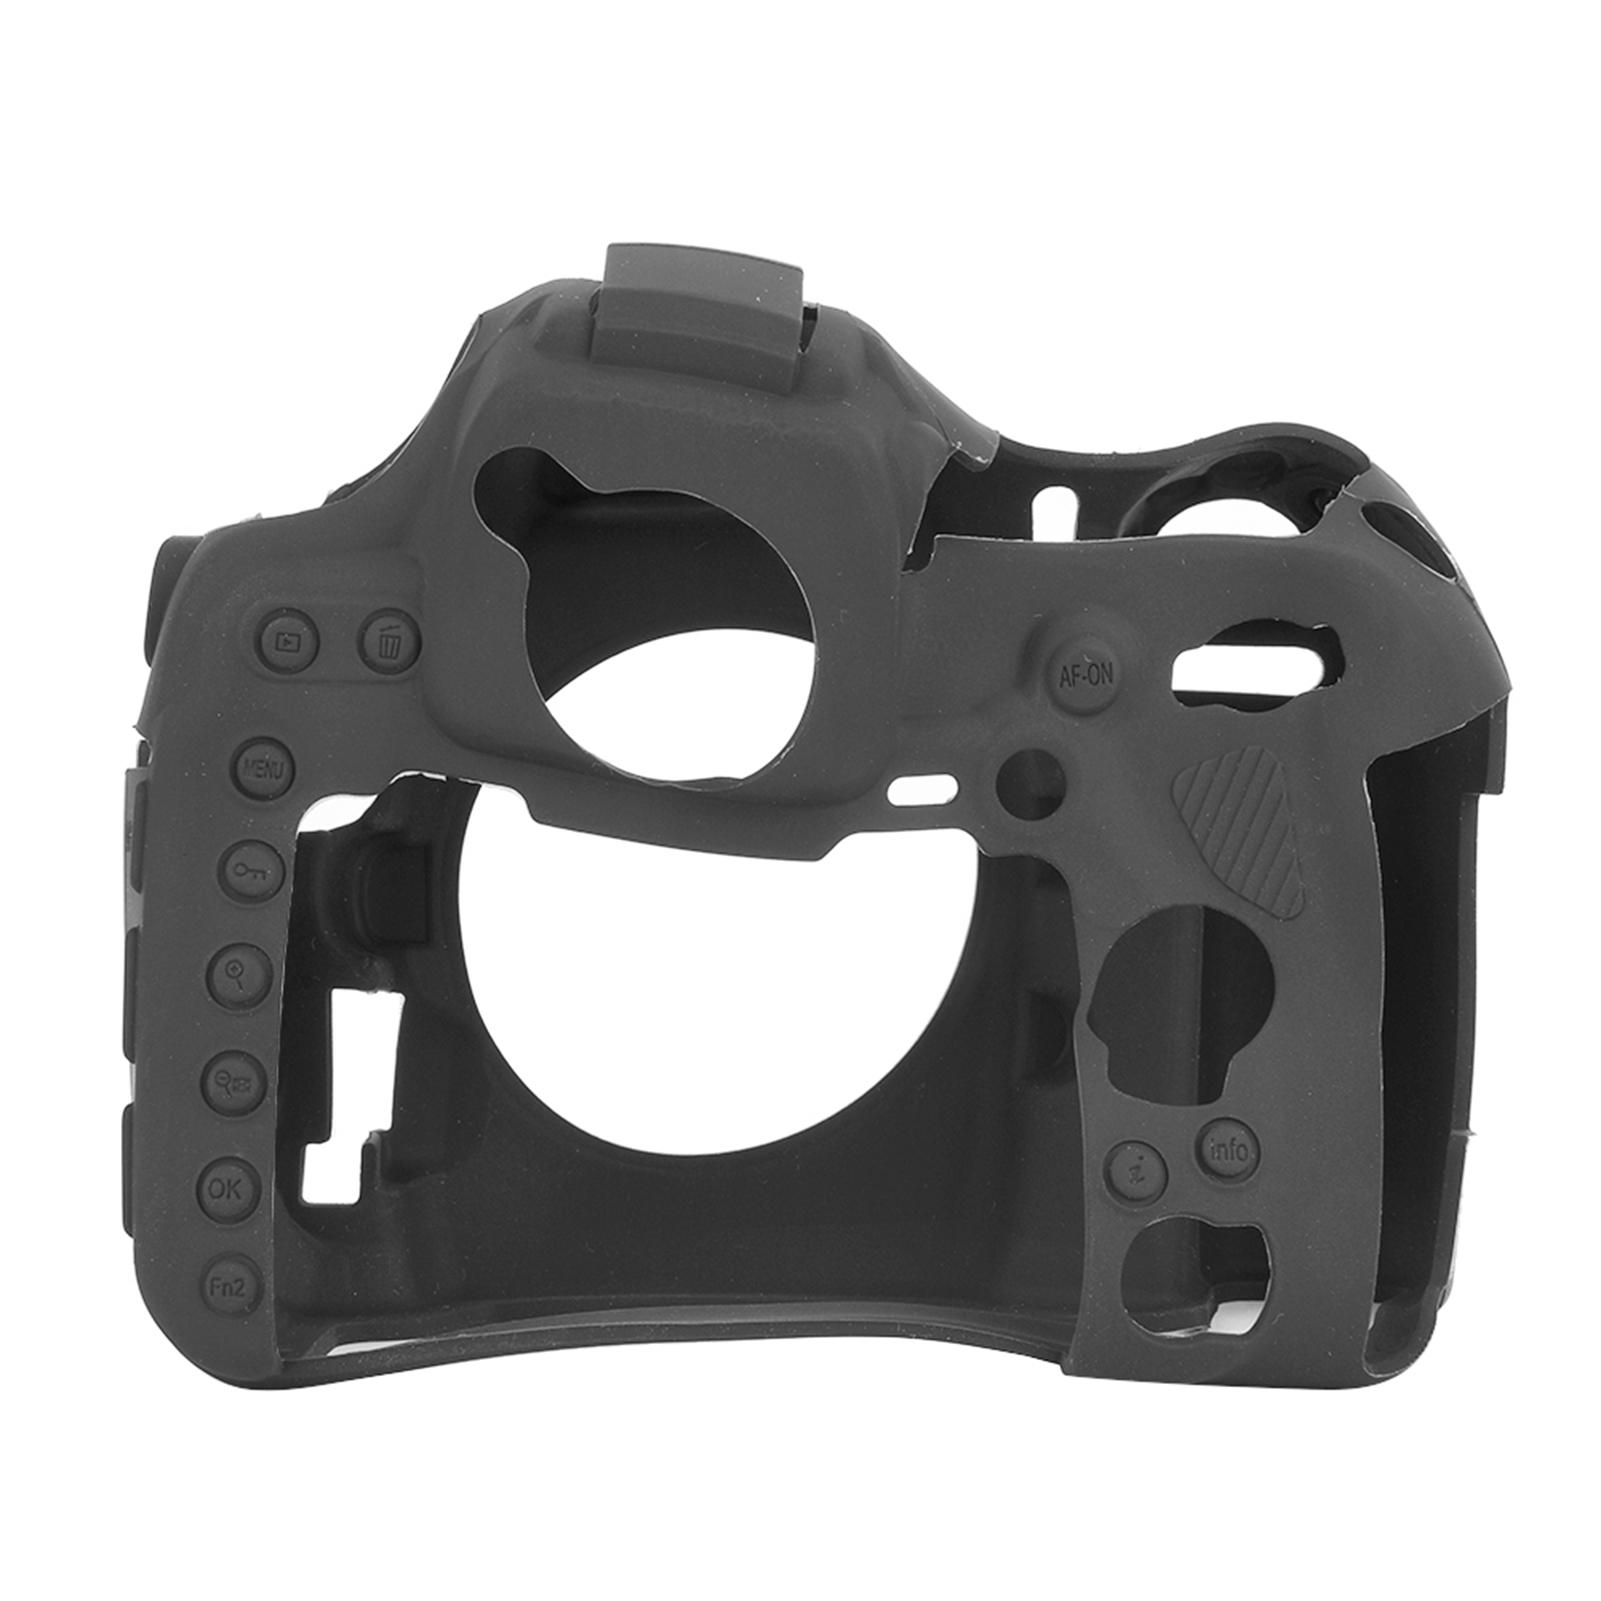 Funda-de-Silicona-Suave-a-Prueba-De-Golpes-Funda-Protectora-De-Camara-Para-Nikon-D5300-D7500-D3400 miniatura 33